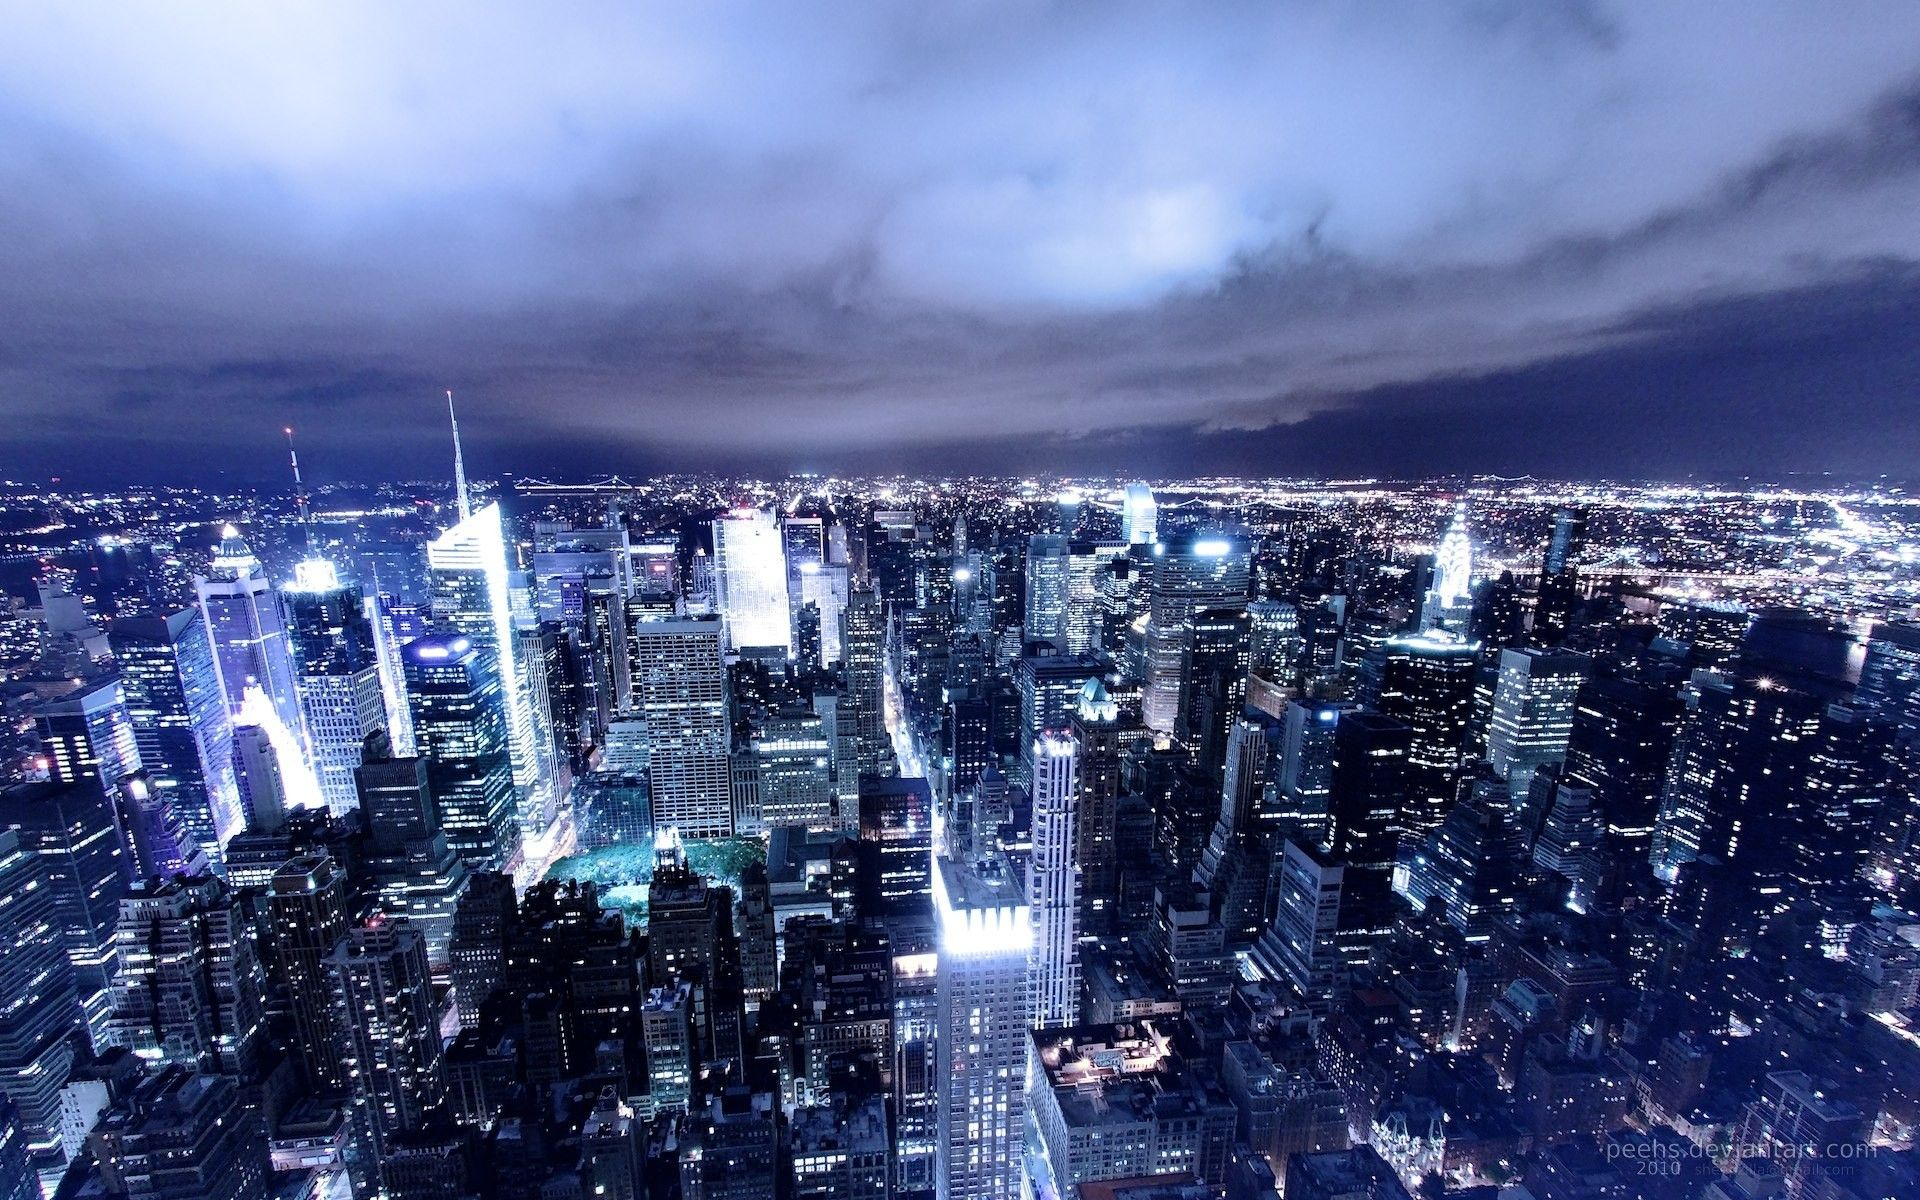 Download Wallpaper 3840x2160 New York Usa Night City Bridge 4k Uhd 16 9 Hd Background Williamsburg Bridge Night City Brooklyn Bridge